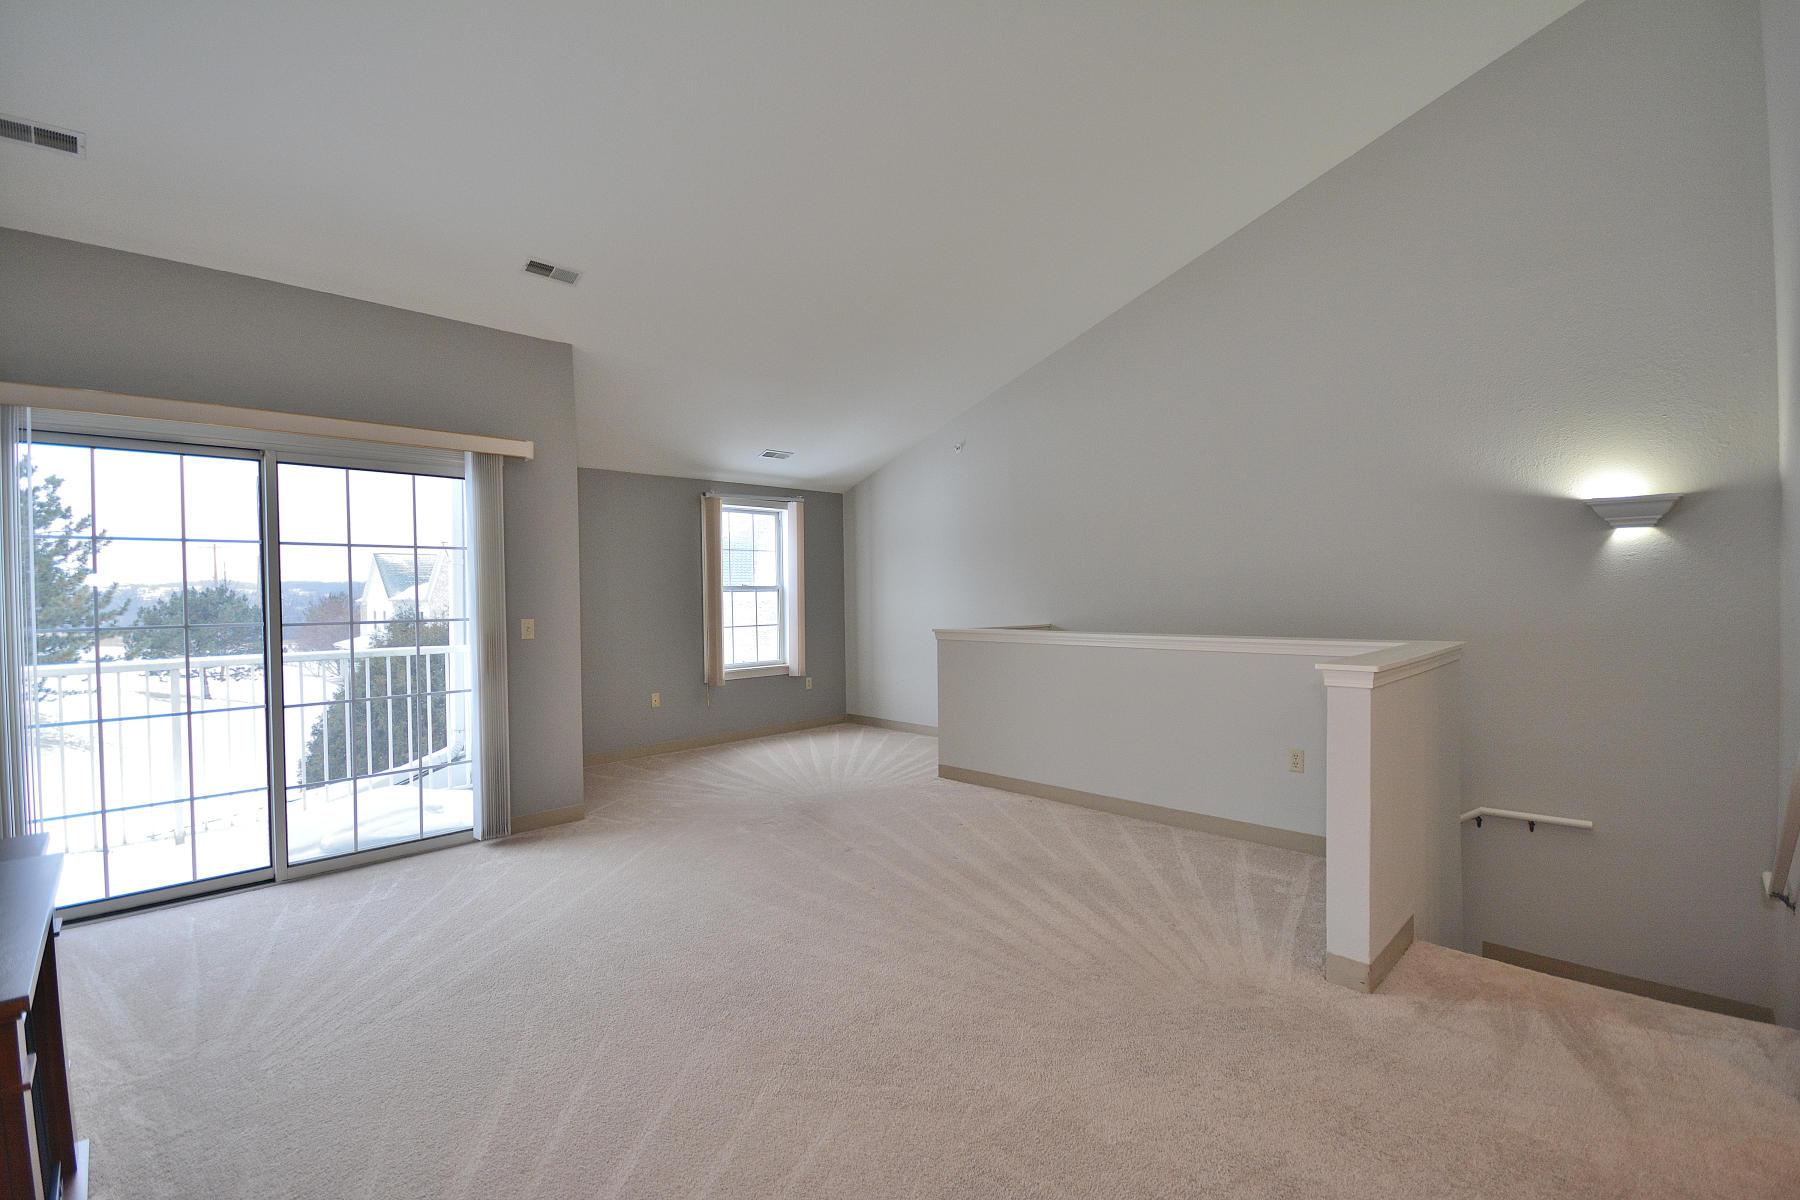 2720 Northview Rd, Waukesha, Wisconsin 53188, 2 Bedrooms Bedrooms, 5 Rooms Rooms,2 BathroomsBathrooms,Condominiums,For Sale,Northview Rd,2,1622477